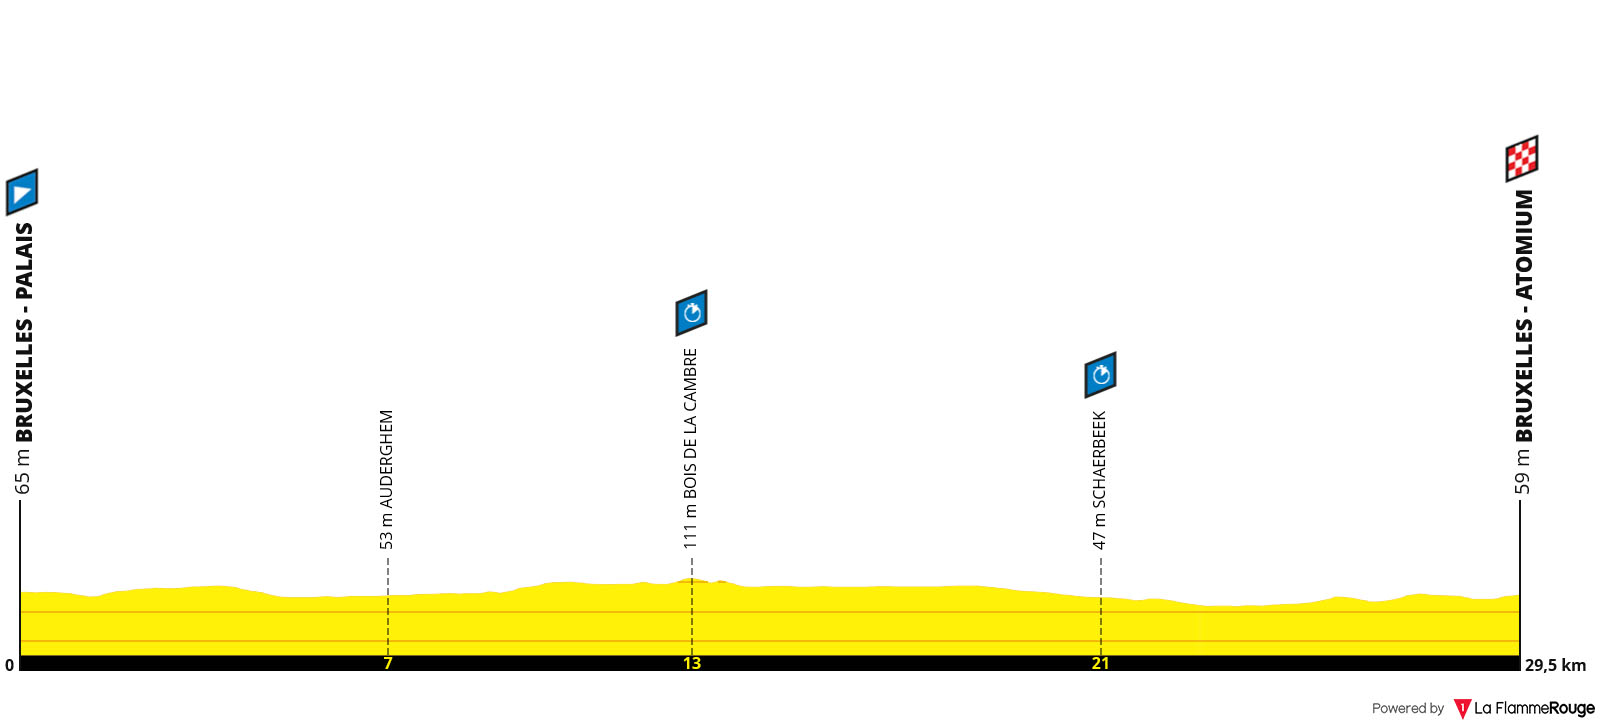 Perfil Etapa 02 - Tour de Francia 2019